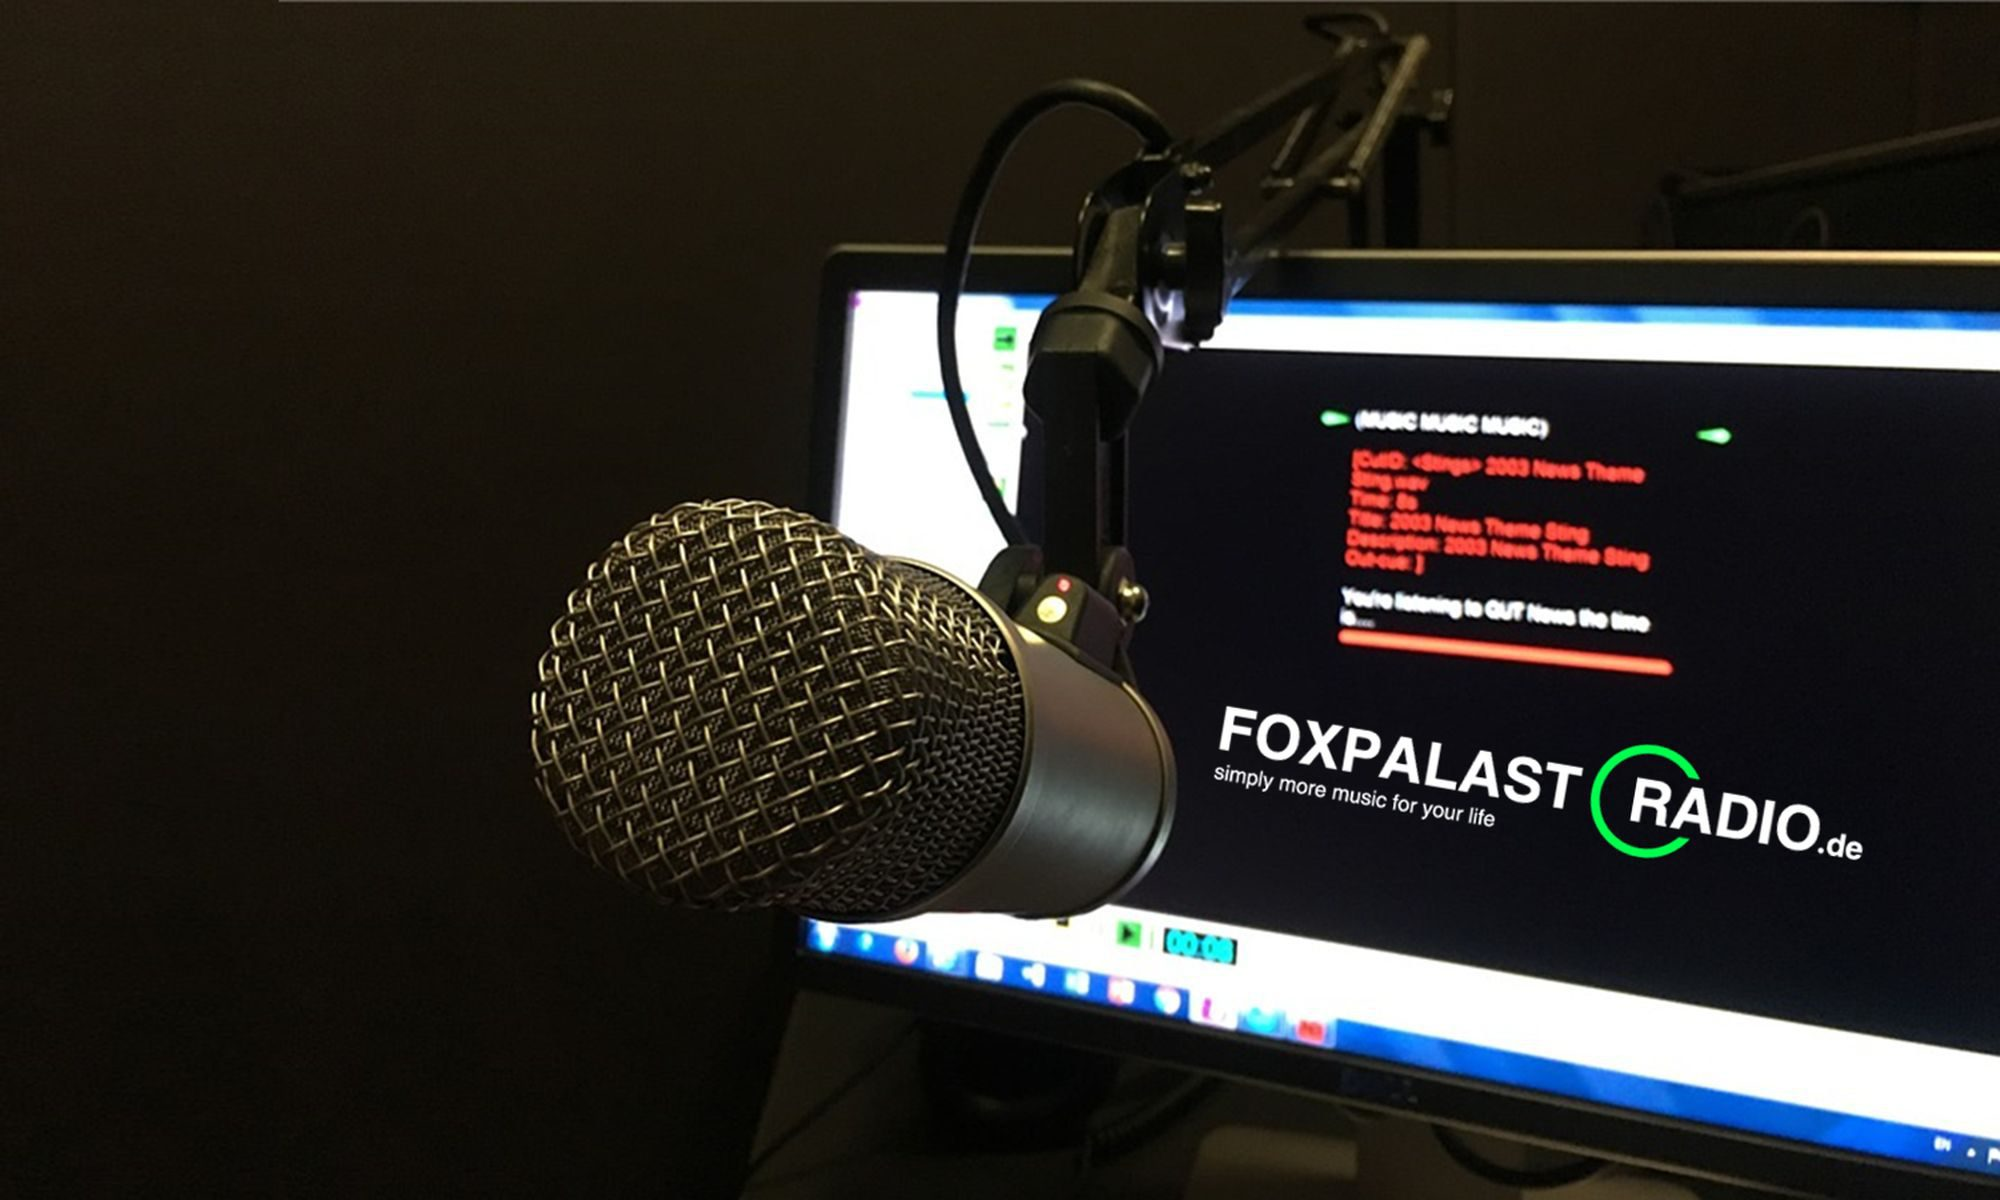 FOXPALAST-Radio